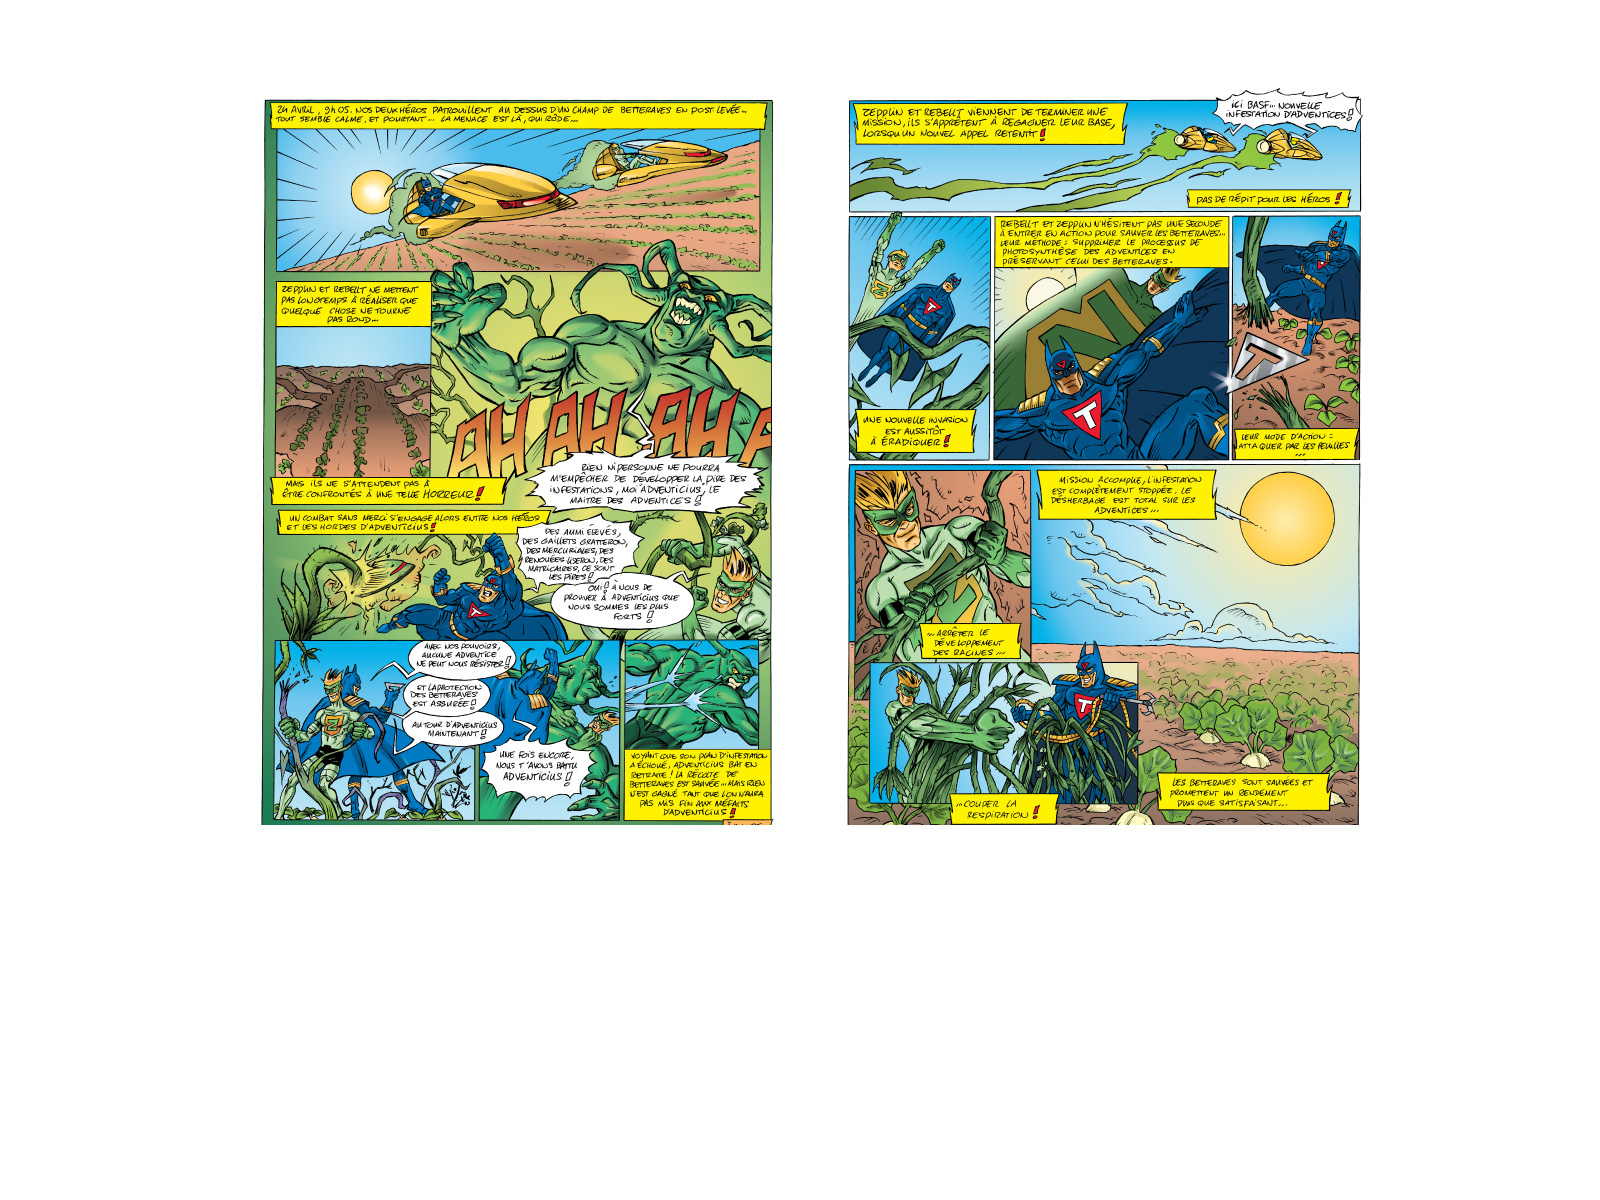 LEDISCOTOlivier-Illustrations-STUDIO BD-3070